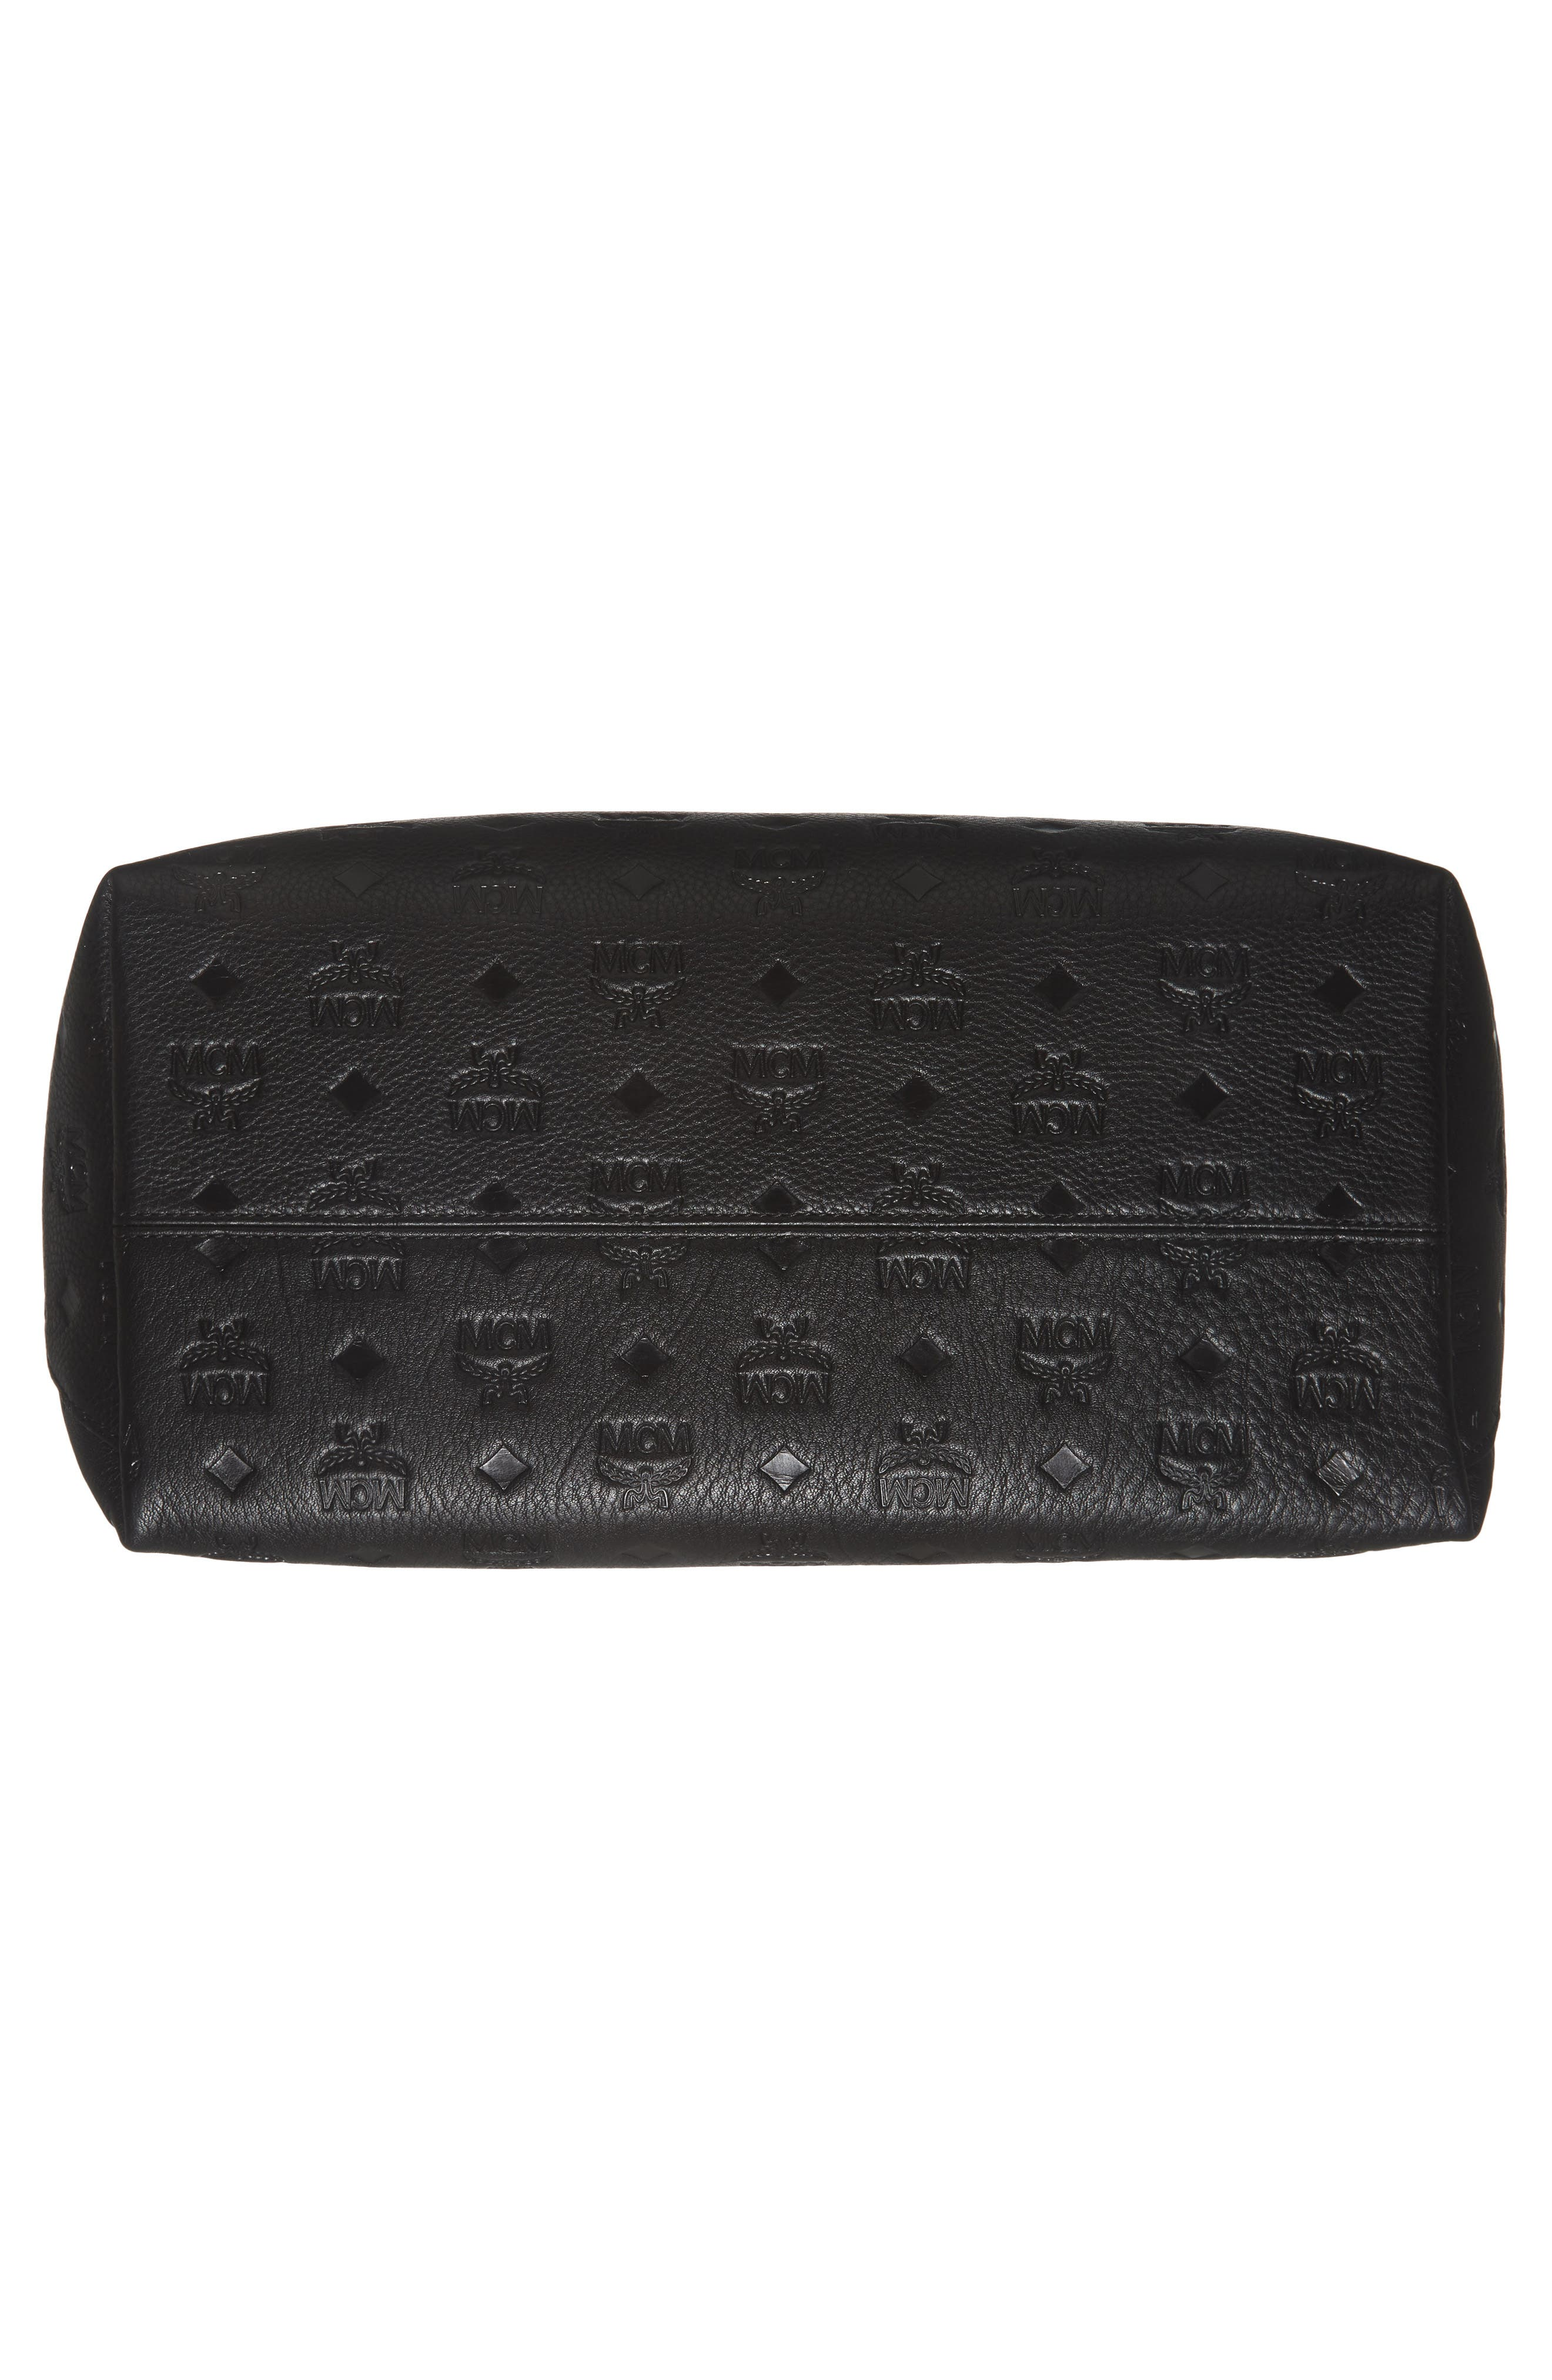 Klara Monogrammed Leather Hobo Bag,                             Alternate thumbnail 6, color,                             BLACK